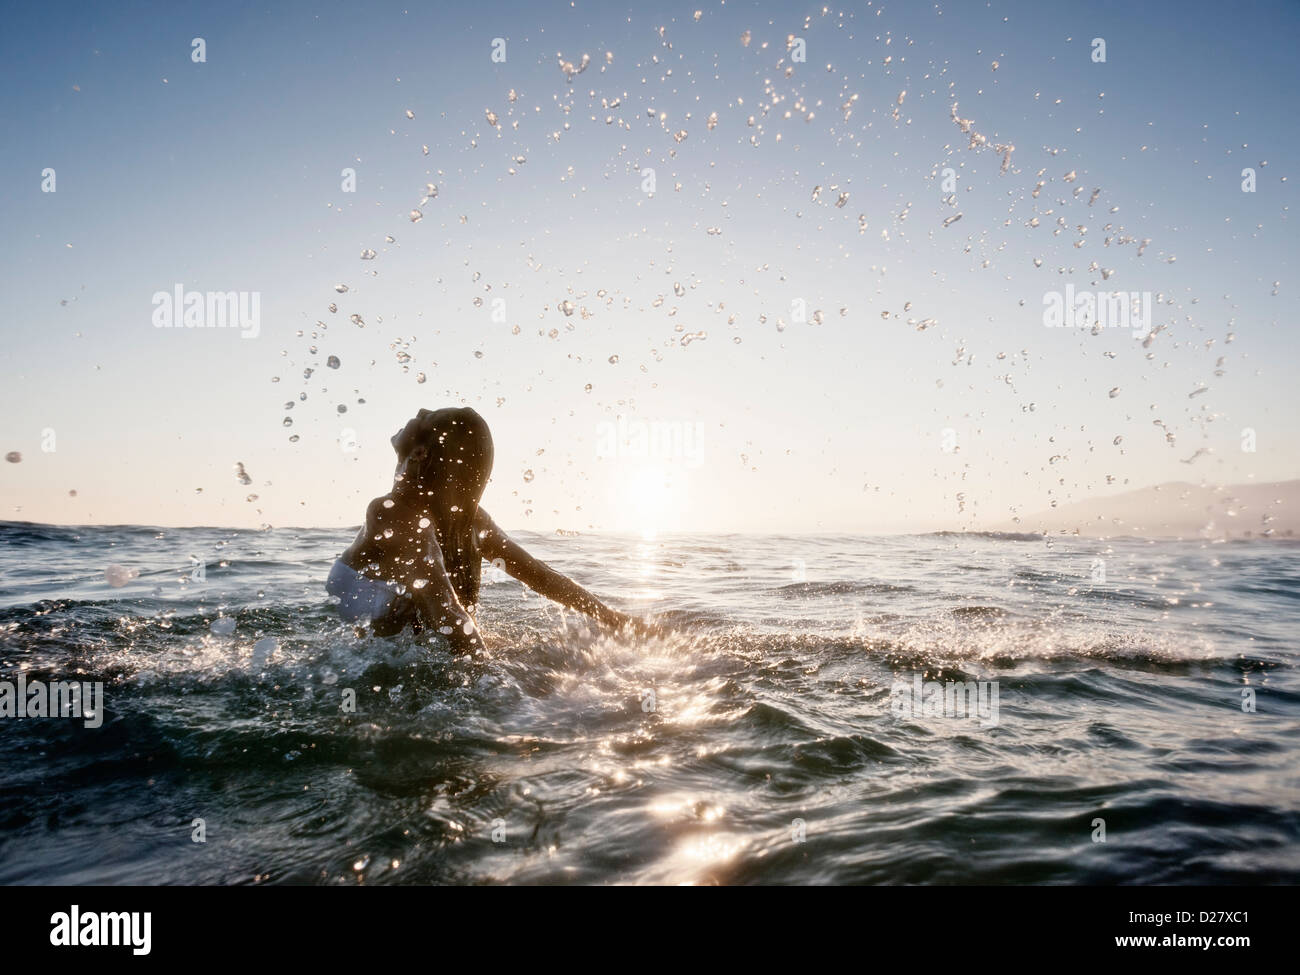 Woman in the sea. - Stock Image